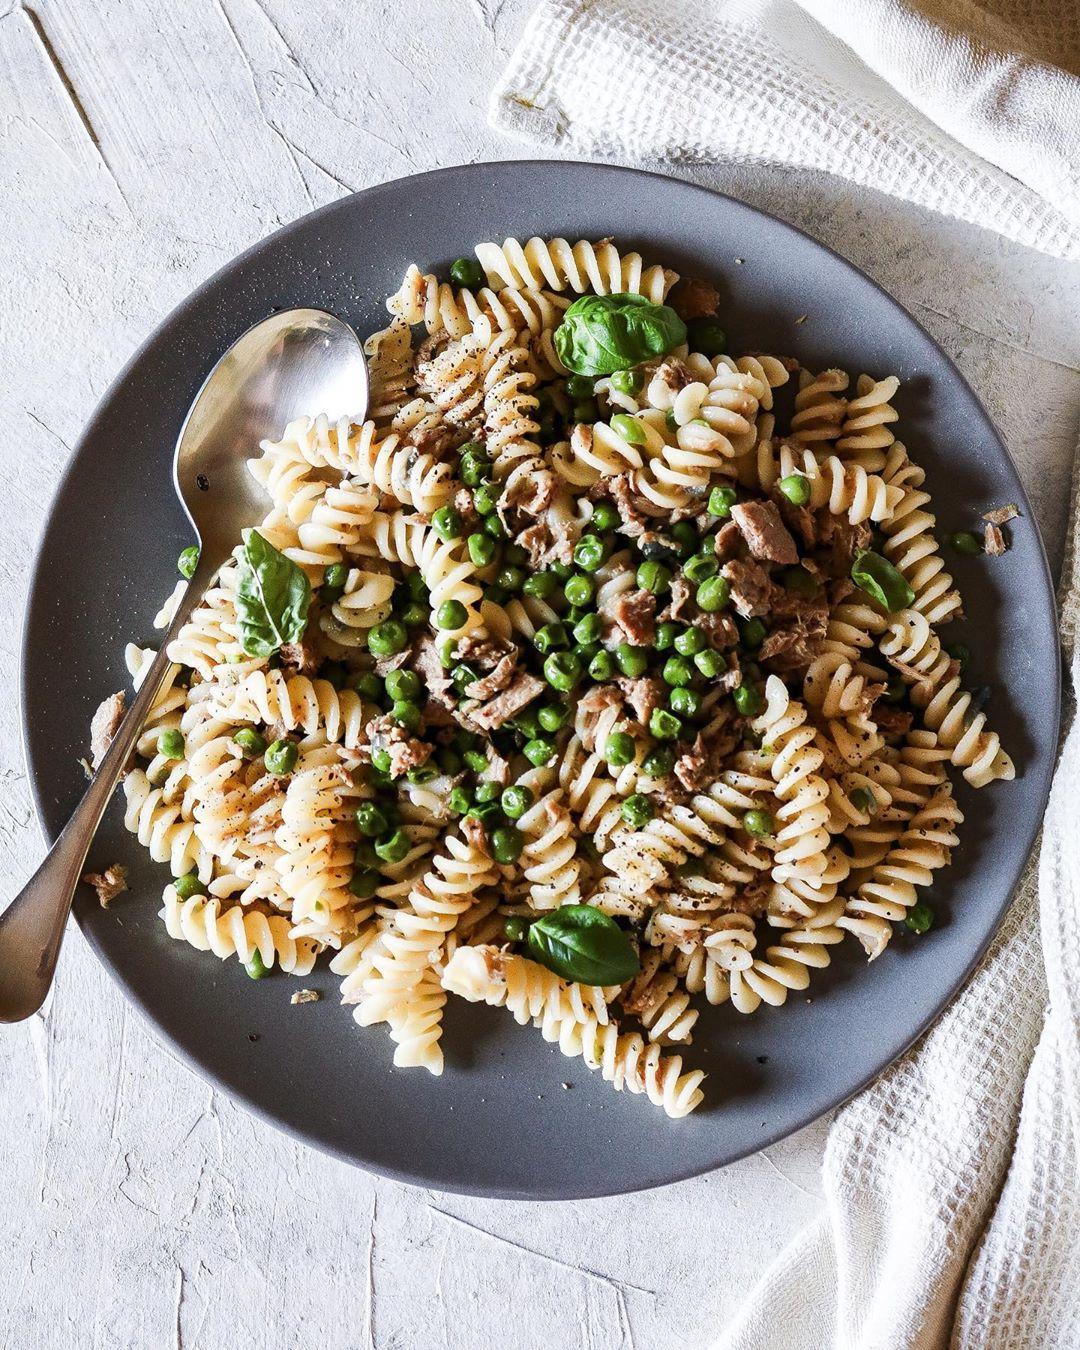 Cosa mangia Elisabetta Gregoraci per tenersi in forma